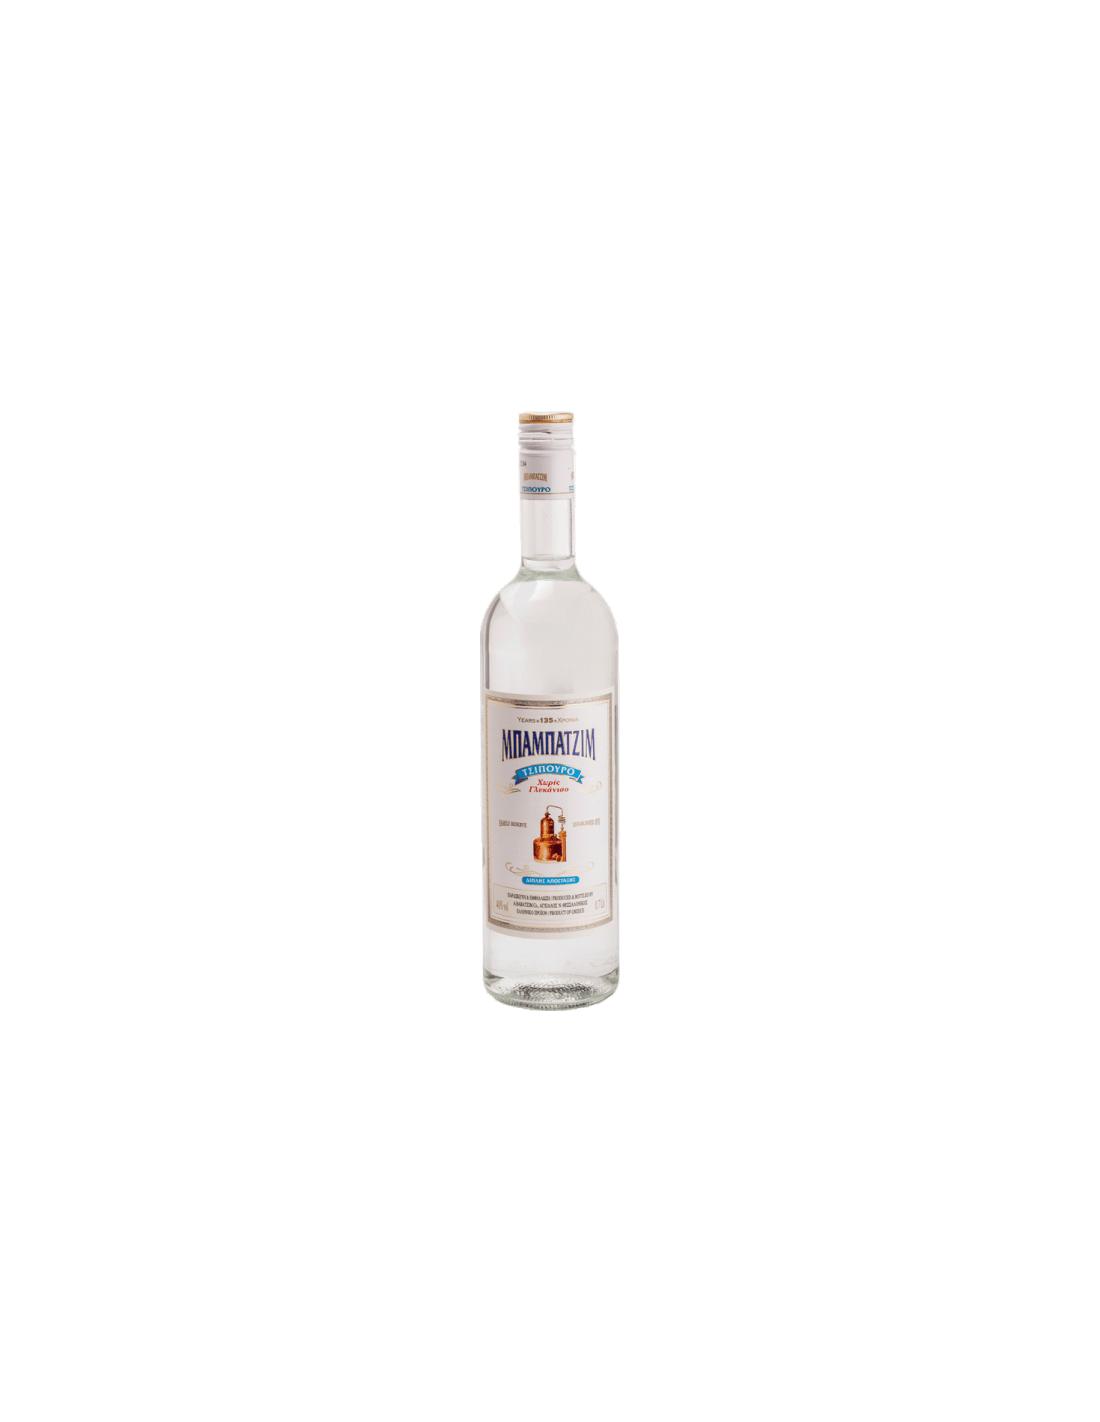 Bautura traditionala digestiva Babatzim, 40% alc., 0.7L